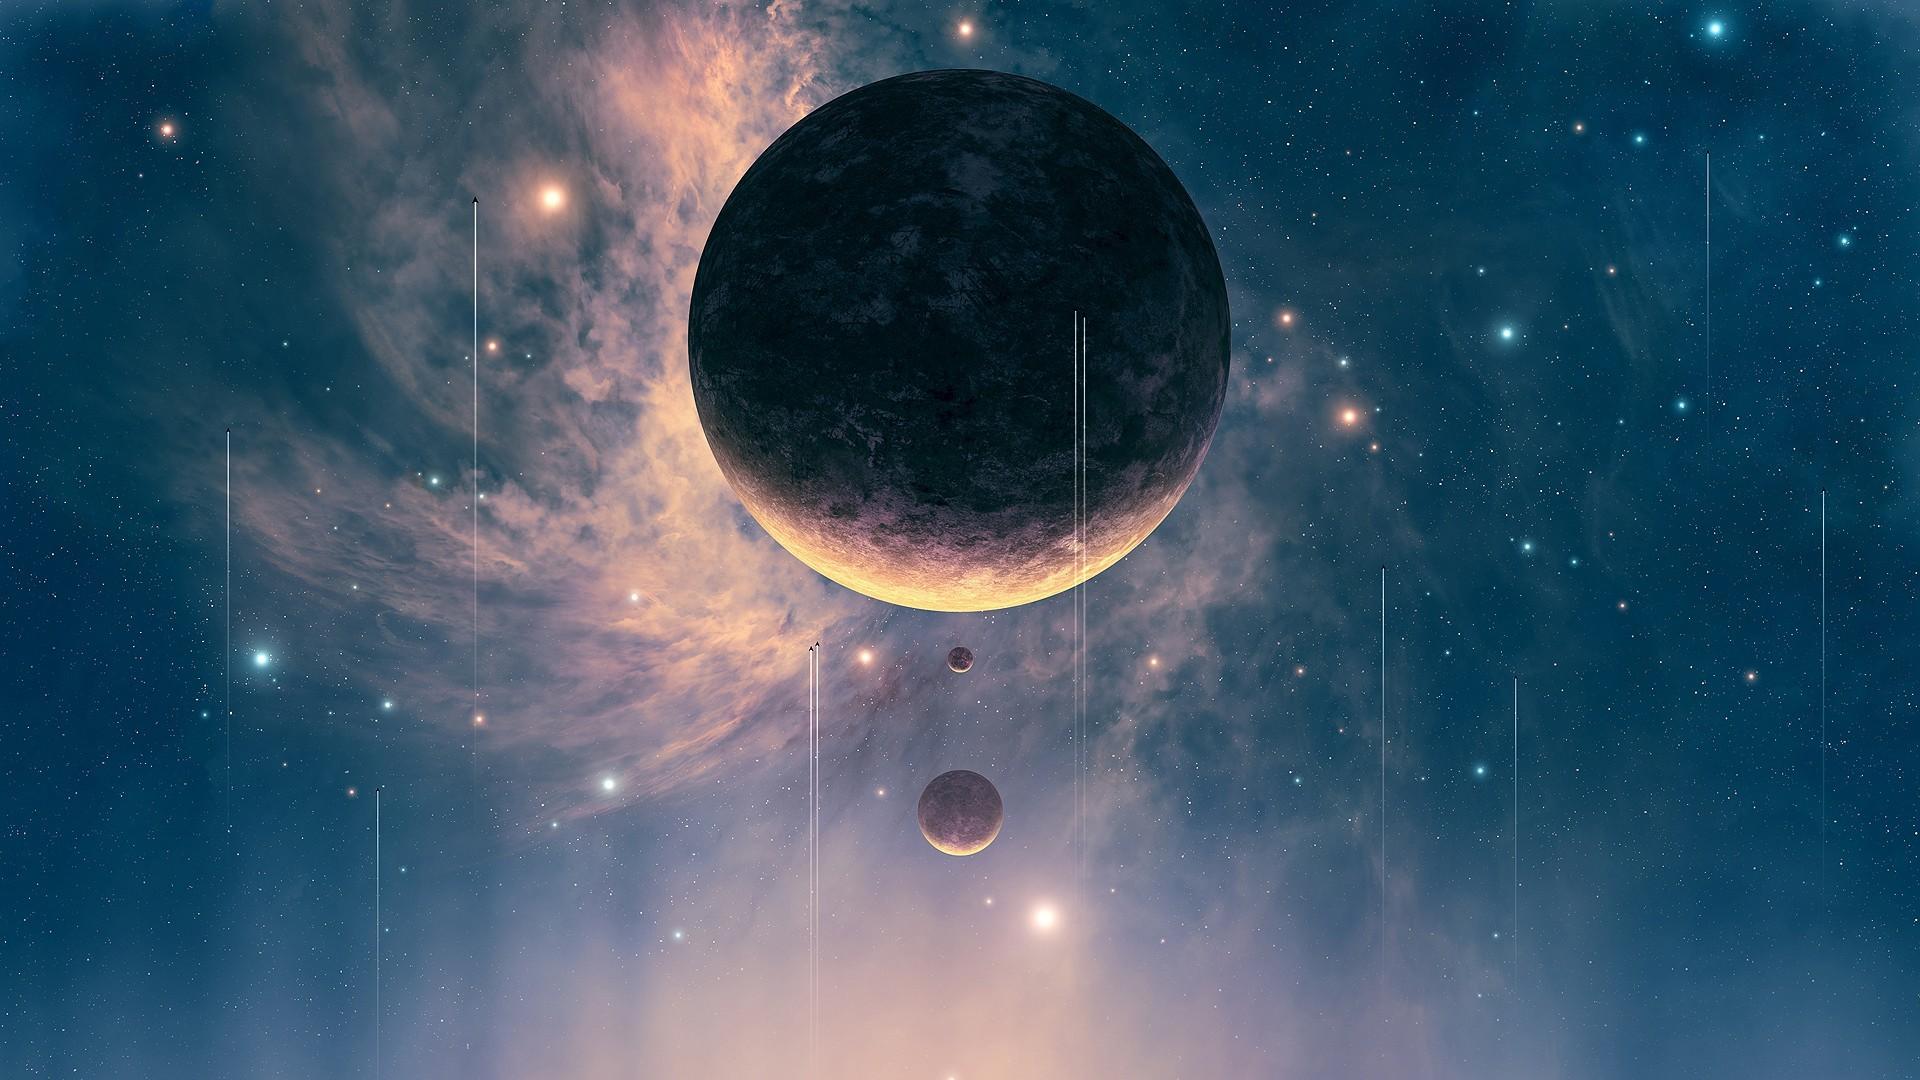 Digital Artwork Futuristic Outer Space Planets Spacescape